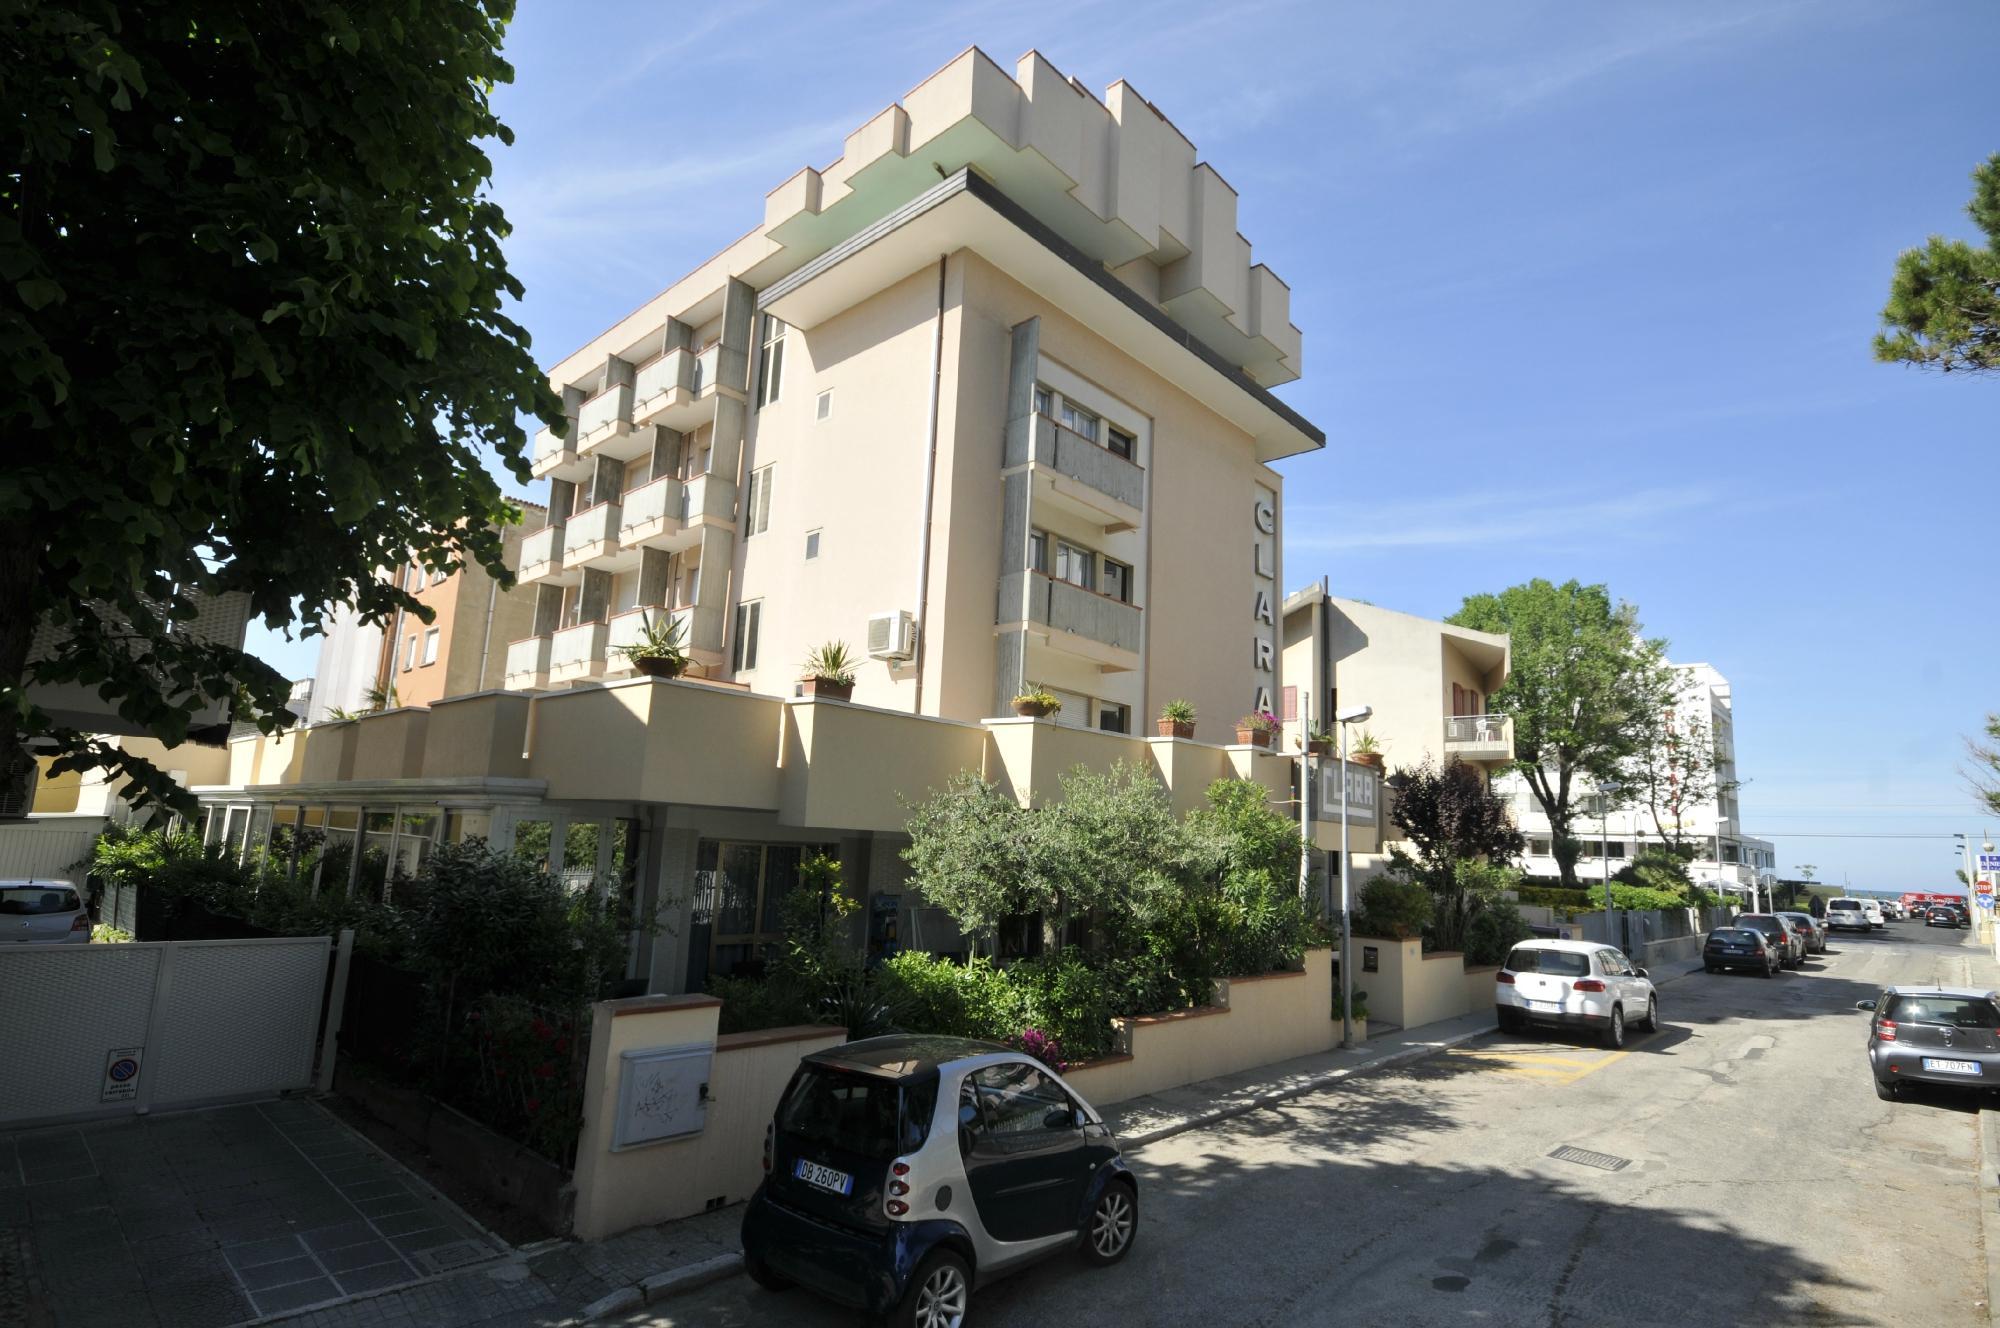 Hotel Clara